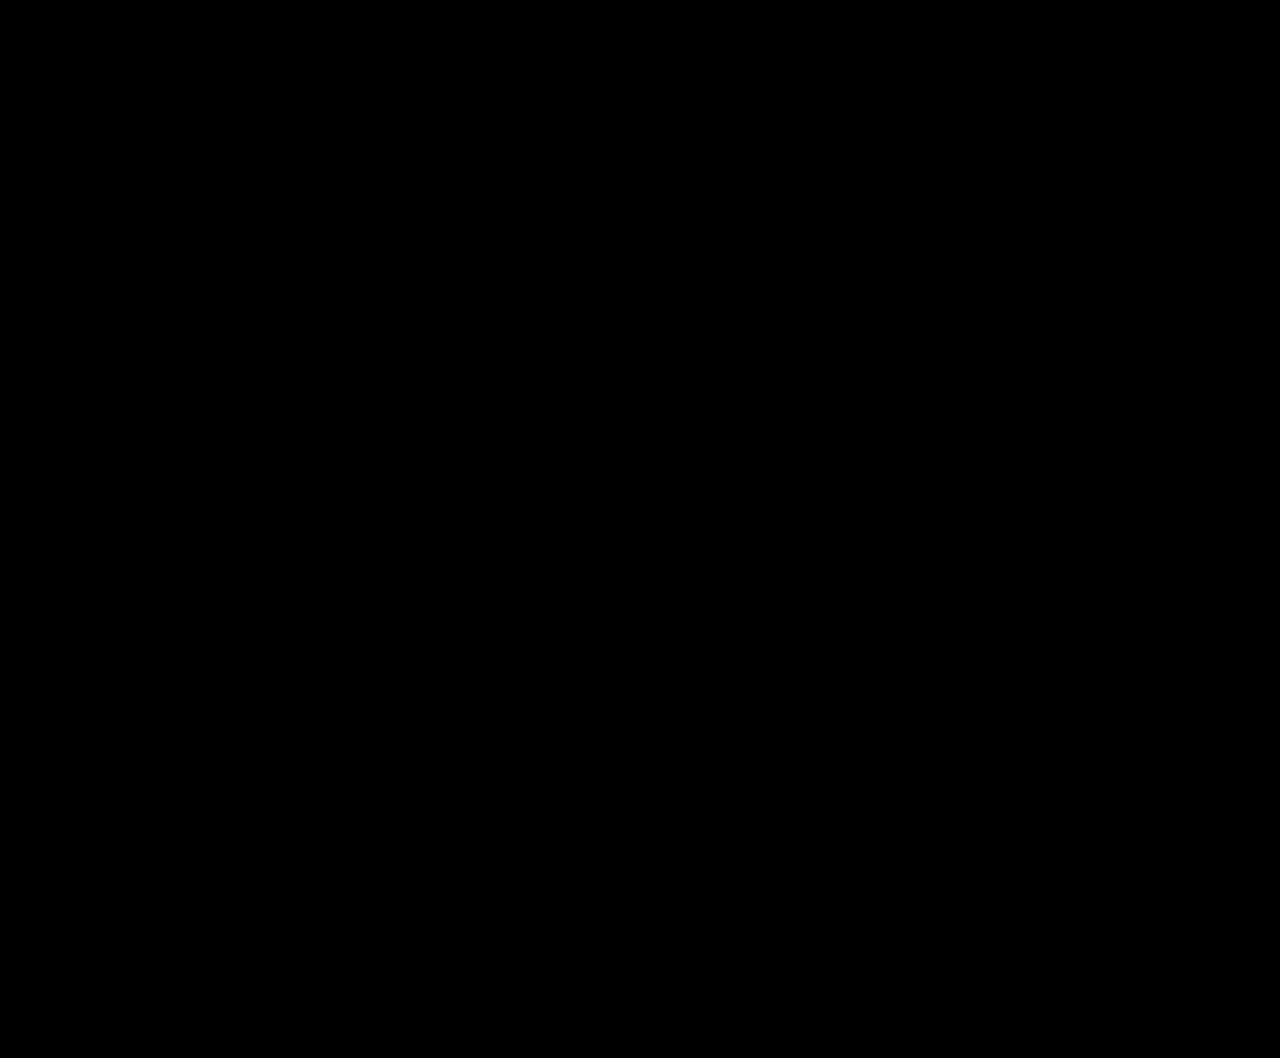 verkaufserfolg-epsilon-faktor-ulrike-knauer-verkaufsseminar-verkaufen-verhandlungsseminar-muenchen-erfolg-misserfolg-verkaeufer-kaeufer-studie-dornroeschen